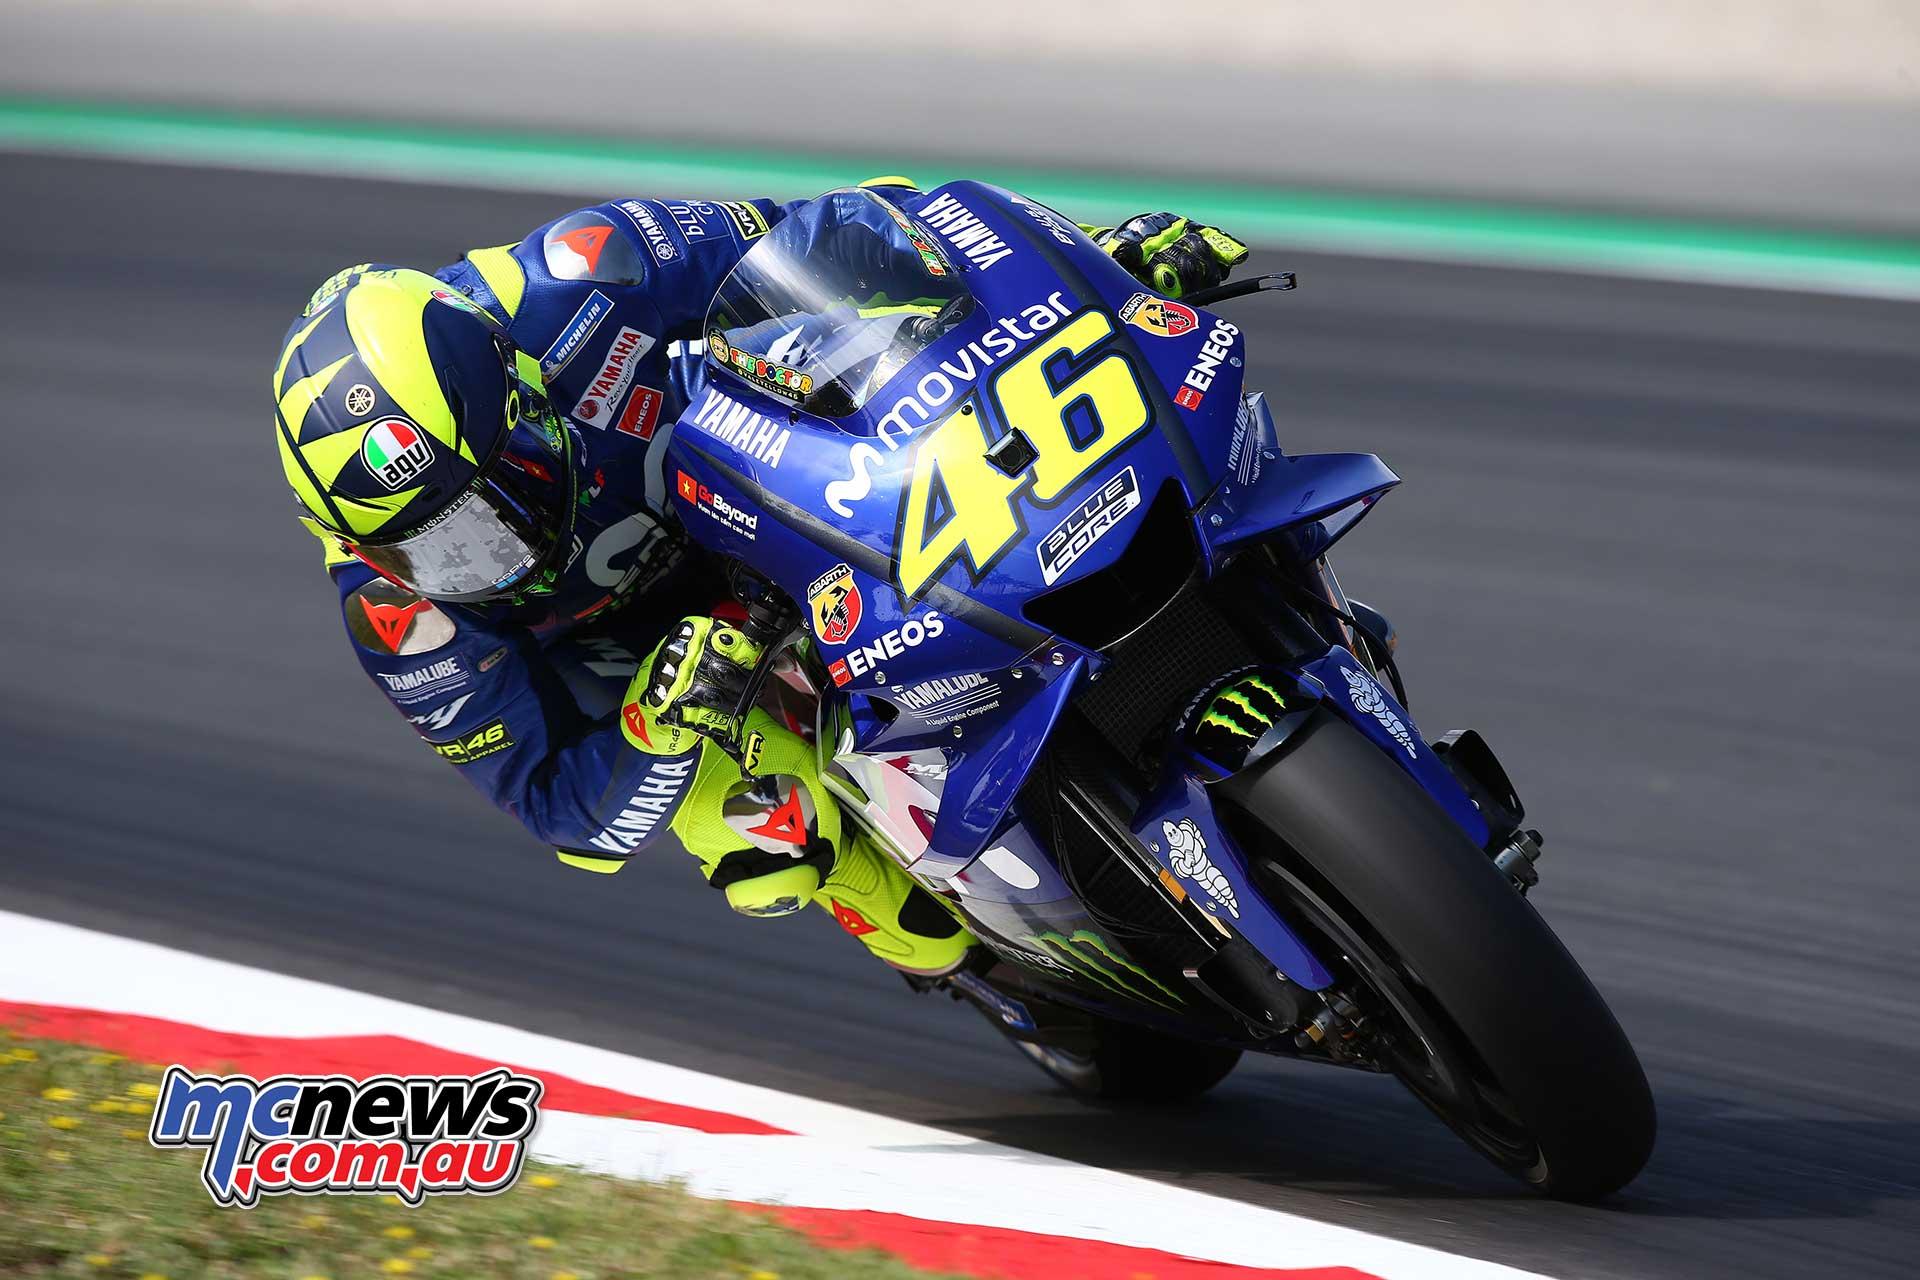 2018 Catalunya MotoGP Images | Gallery C | MCNews.com.au